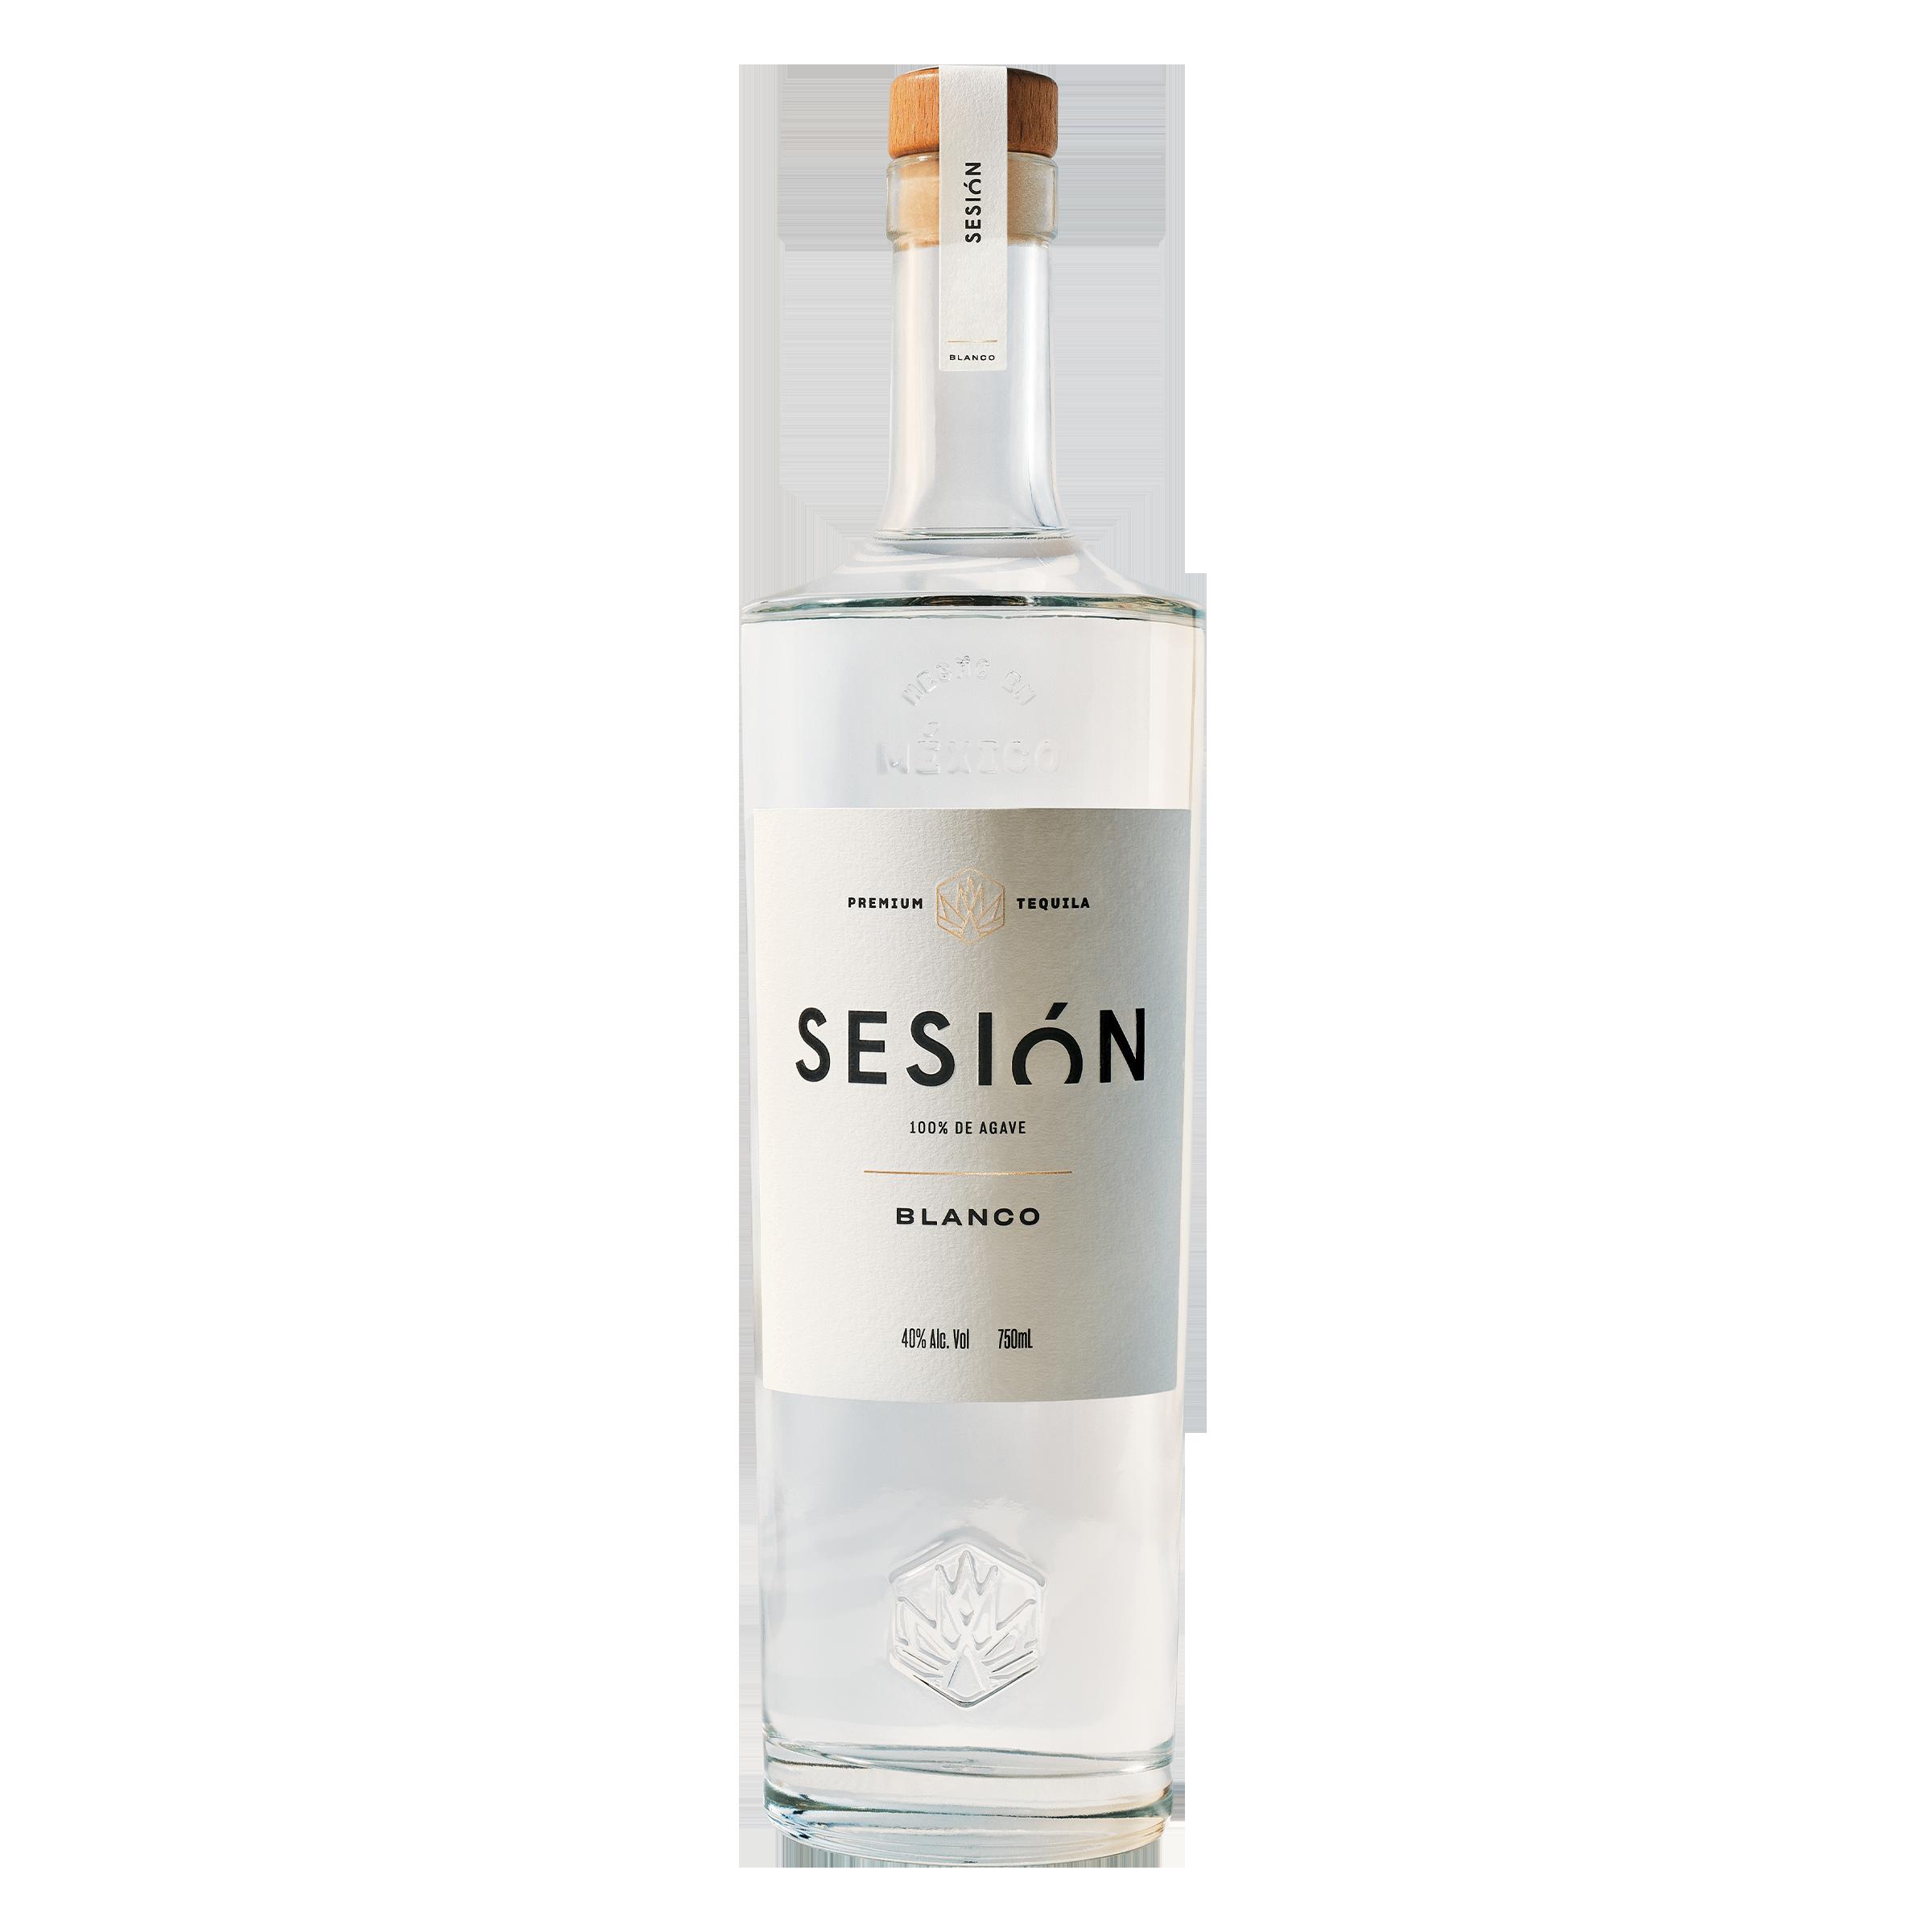 Sesión Tequila Blanco 750ml